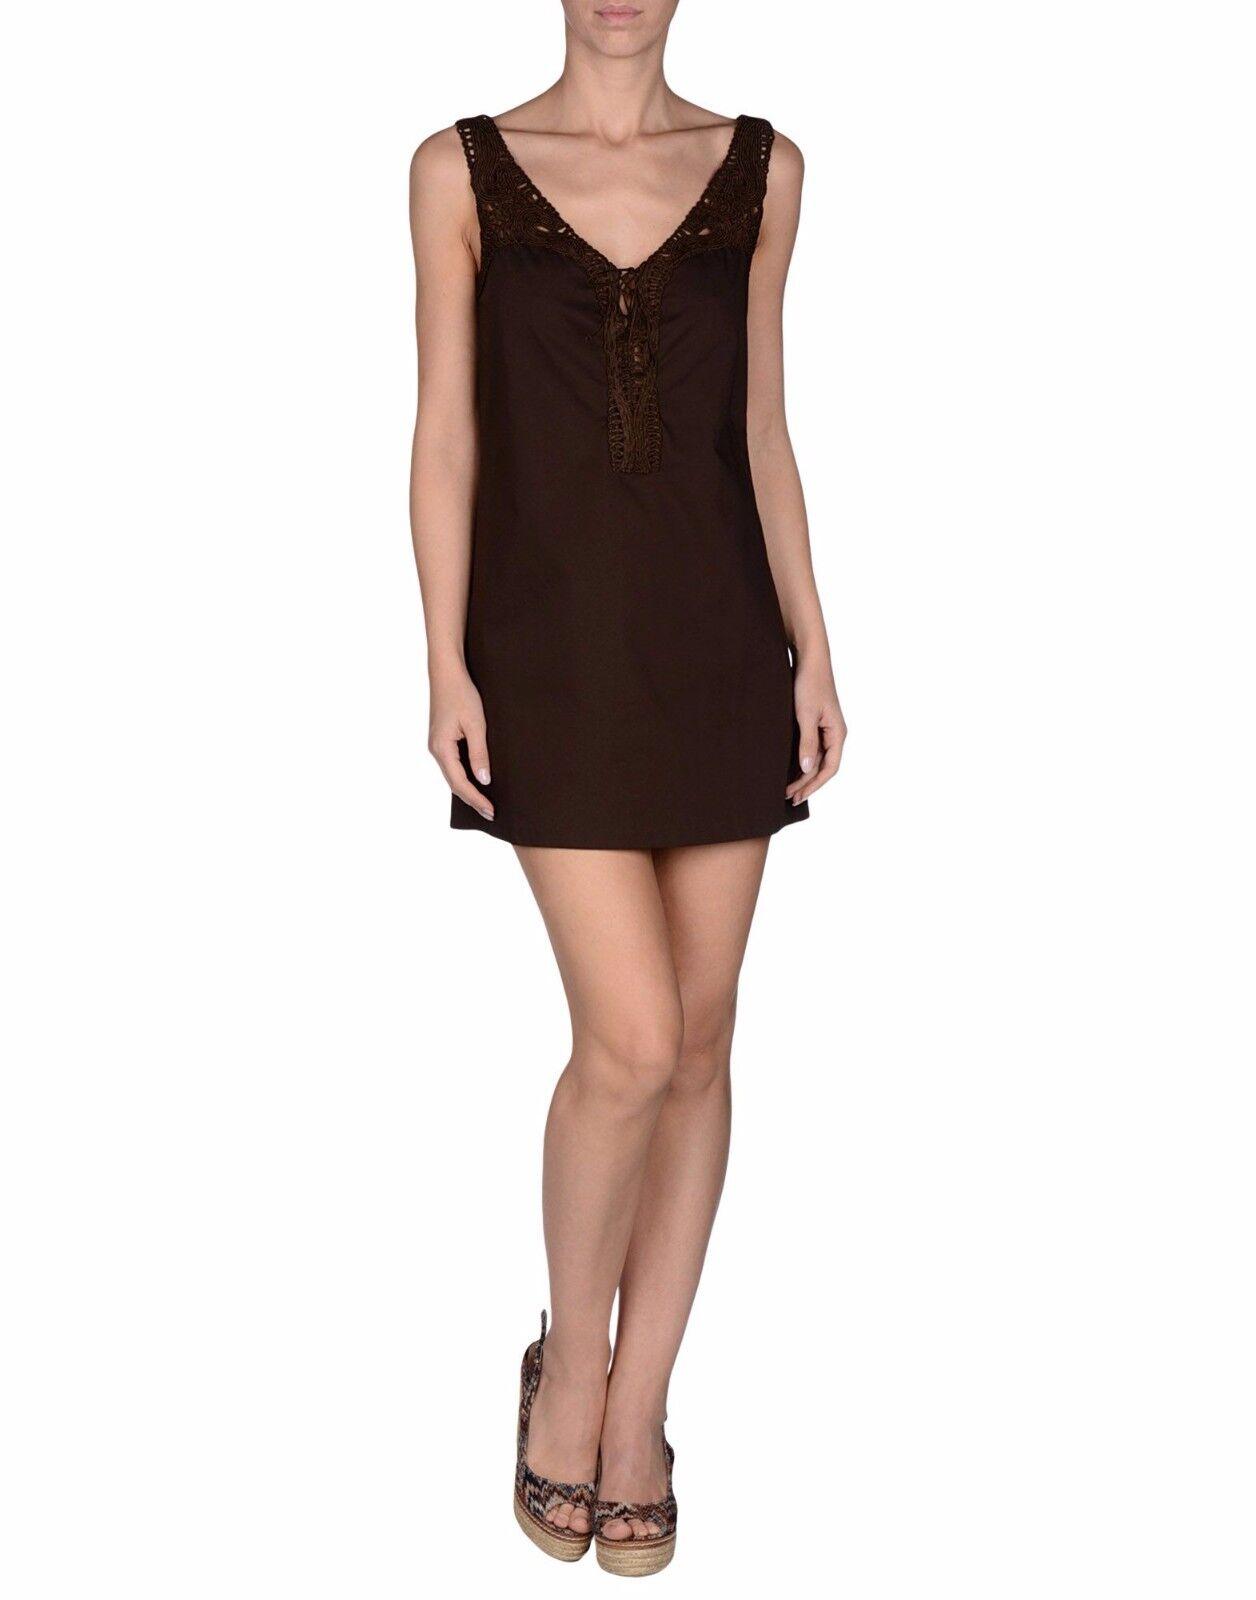 NEW  Ermanno Scervino Dress Beachwear braun Cotton Stretch Tunic IT42  US S